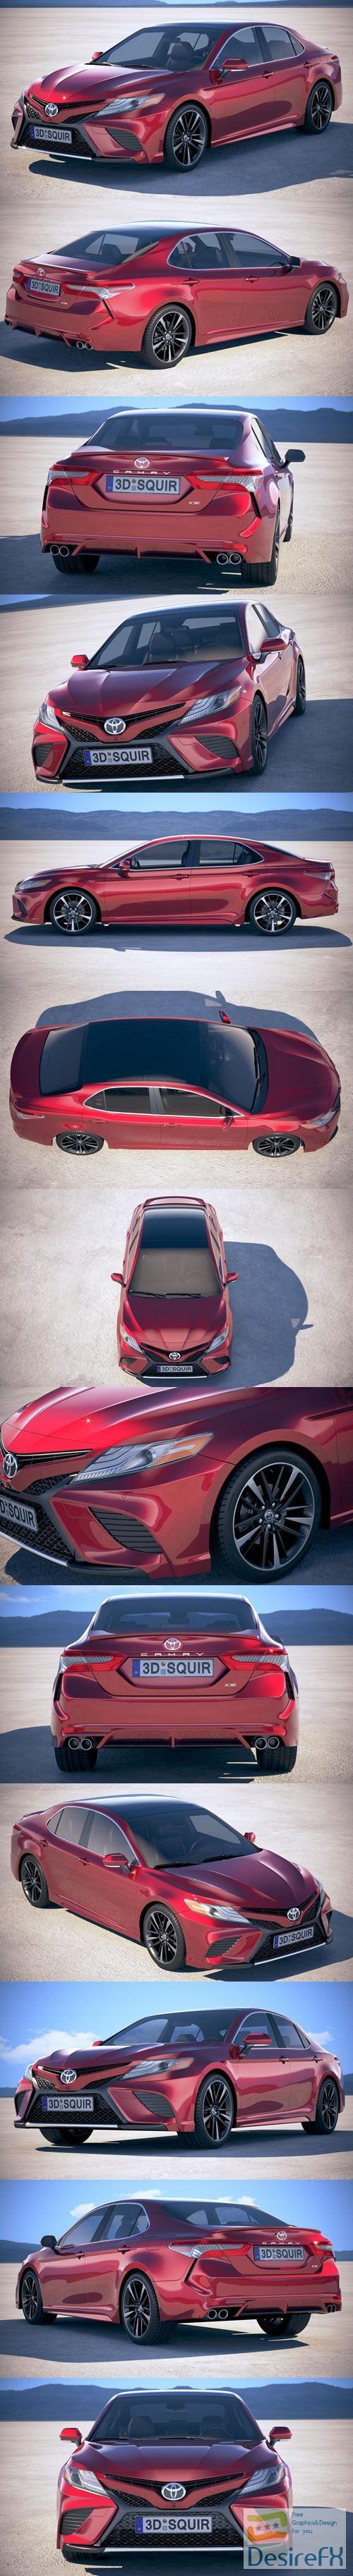 3d-models - Toyota Camry SE 2018 3D Model